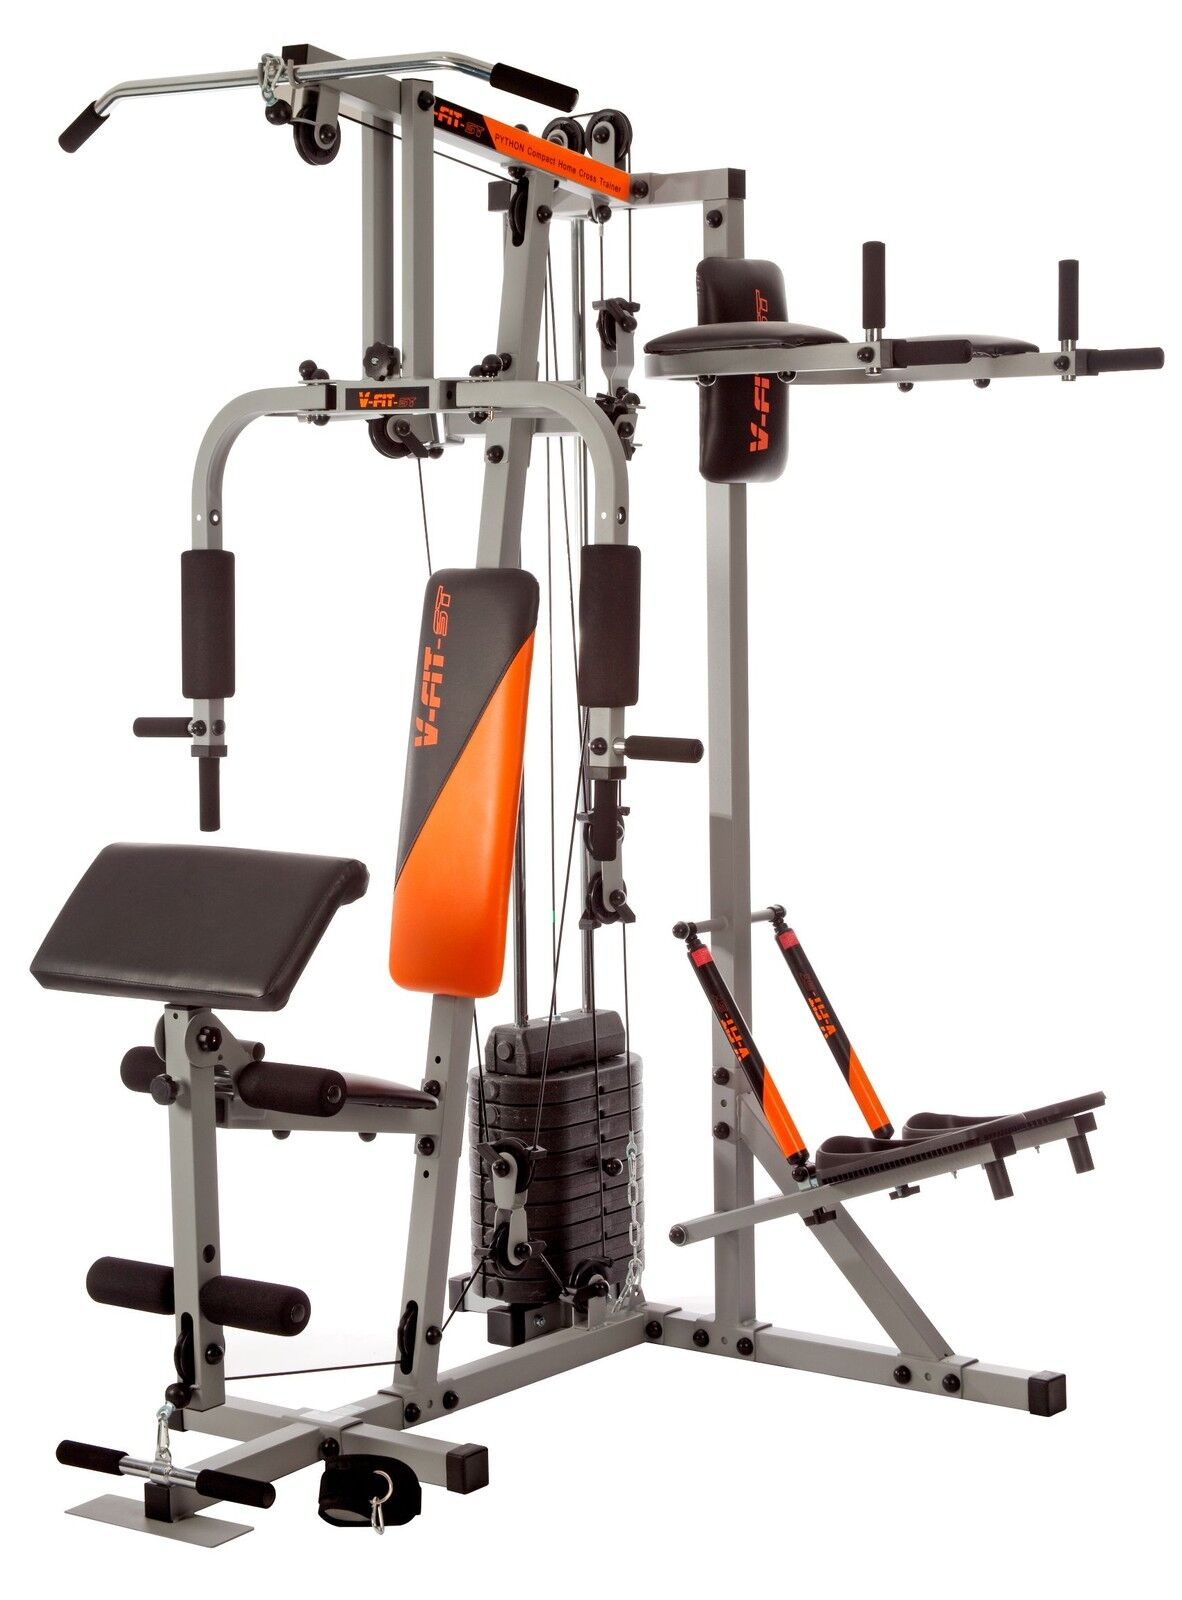 V-fit STG/09-3 Herculean Compact Python Home Multi Gym 100kg r.r.p 600.00